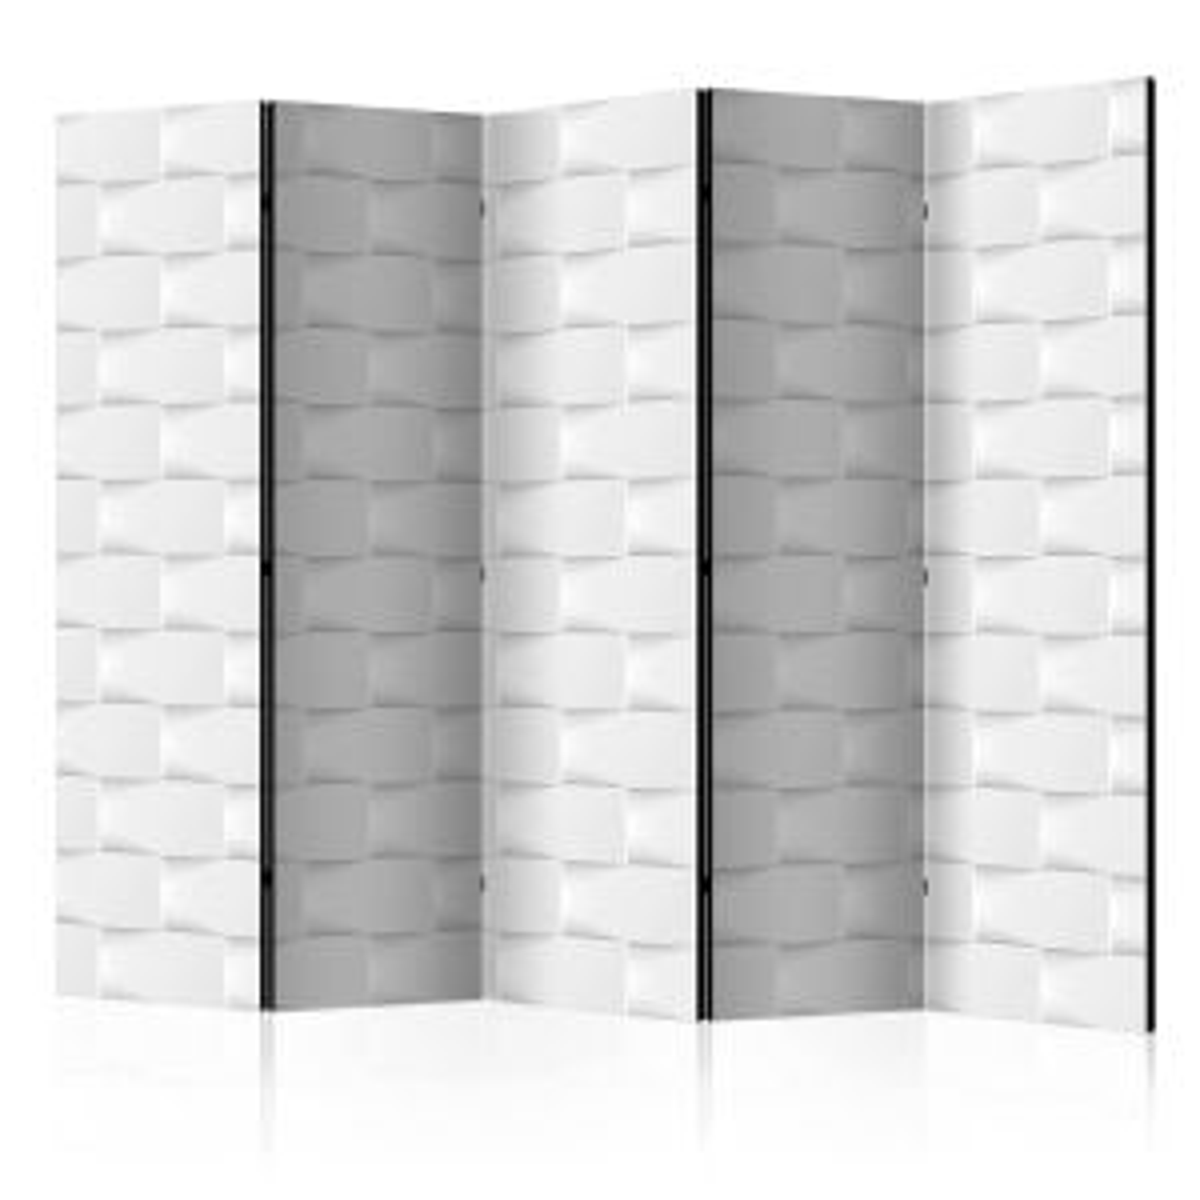 Parawan 5-częściowy - Abstrakcyjny parawan II [Room Dividers]